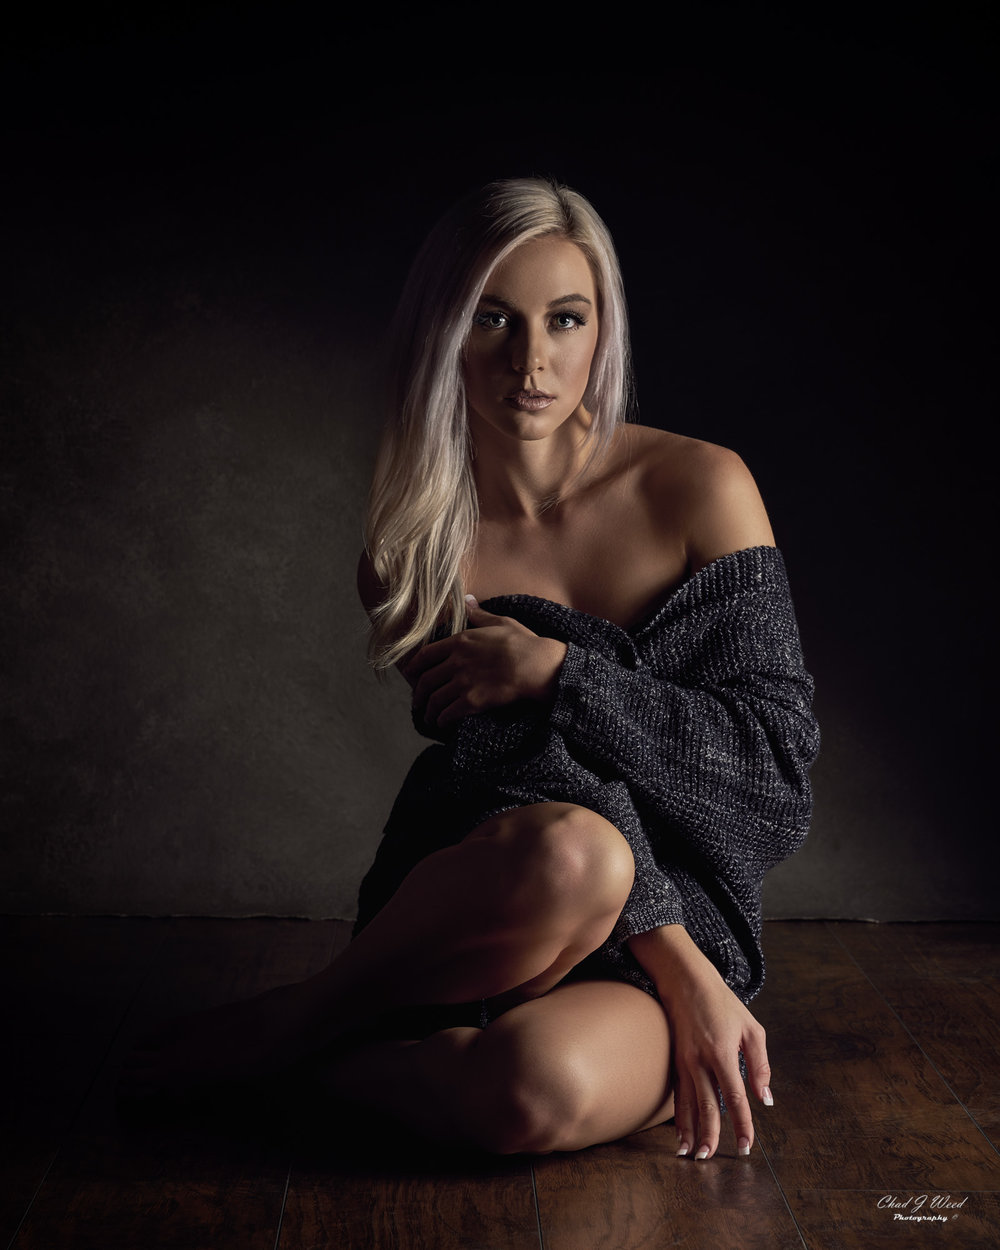 Arizona Fashion Portrait Photographer Chad Weed of Fashion Model Taylor